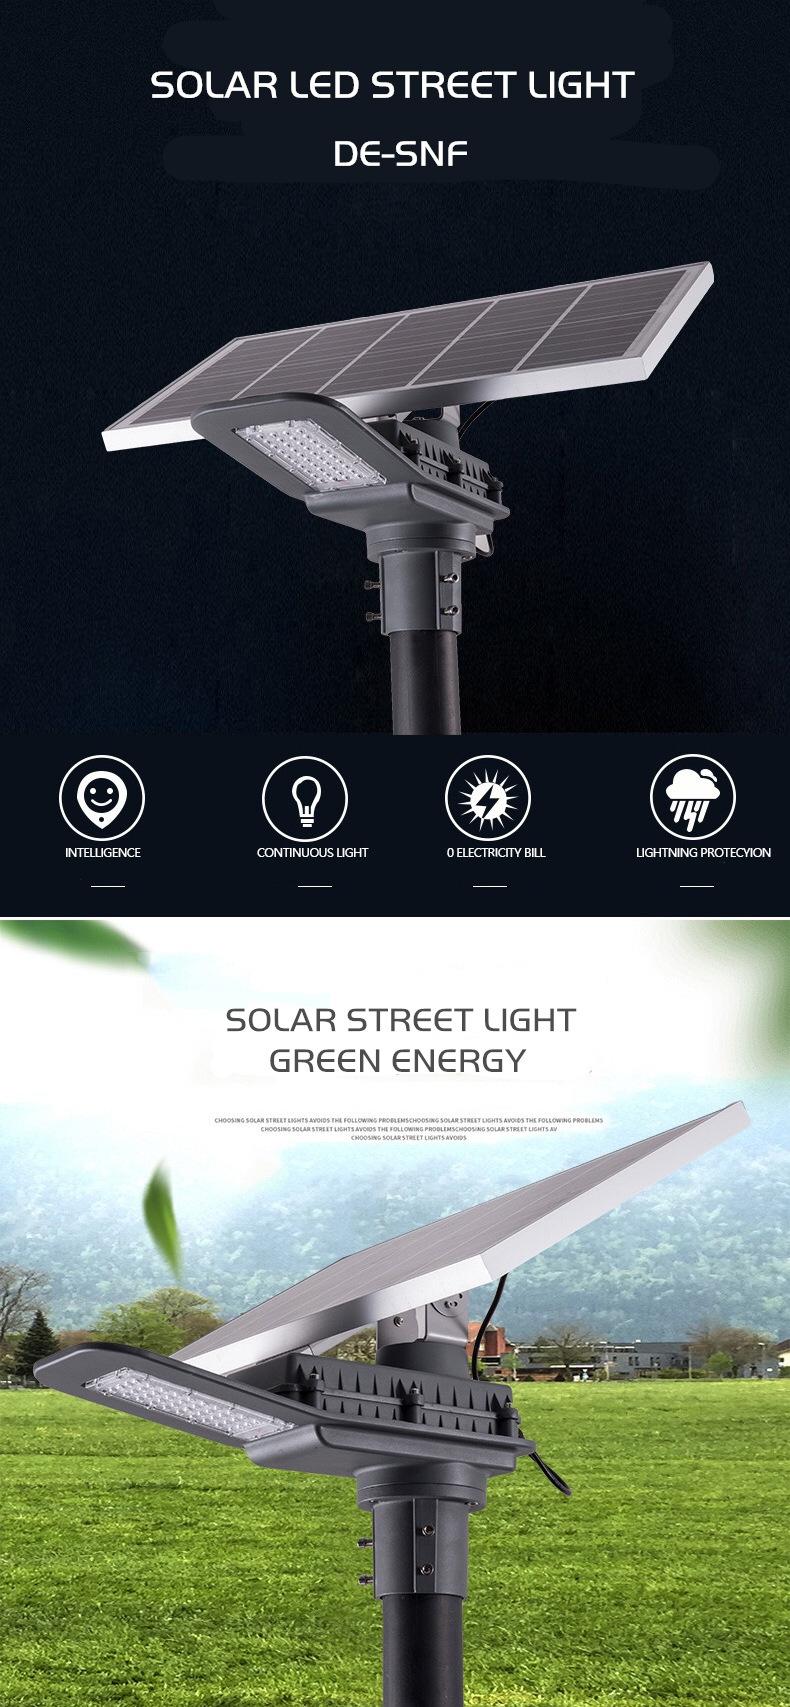 DE-SNF SOLAR LED STREET LIGHT DELIGHT ECO ENERGY